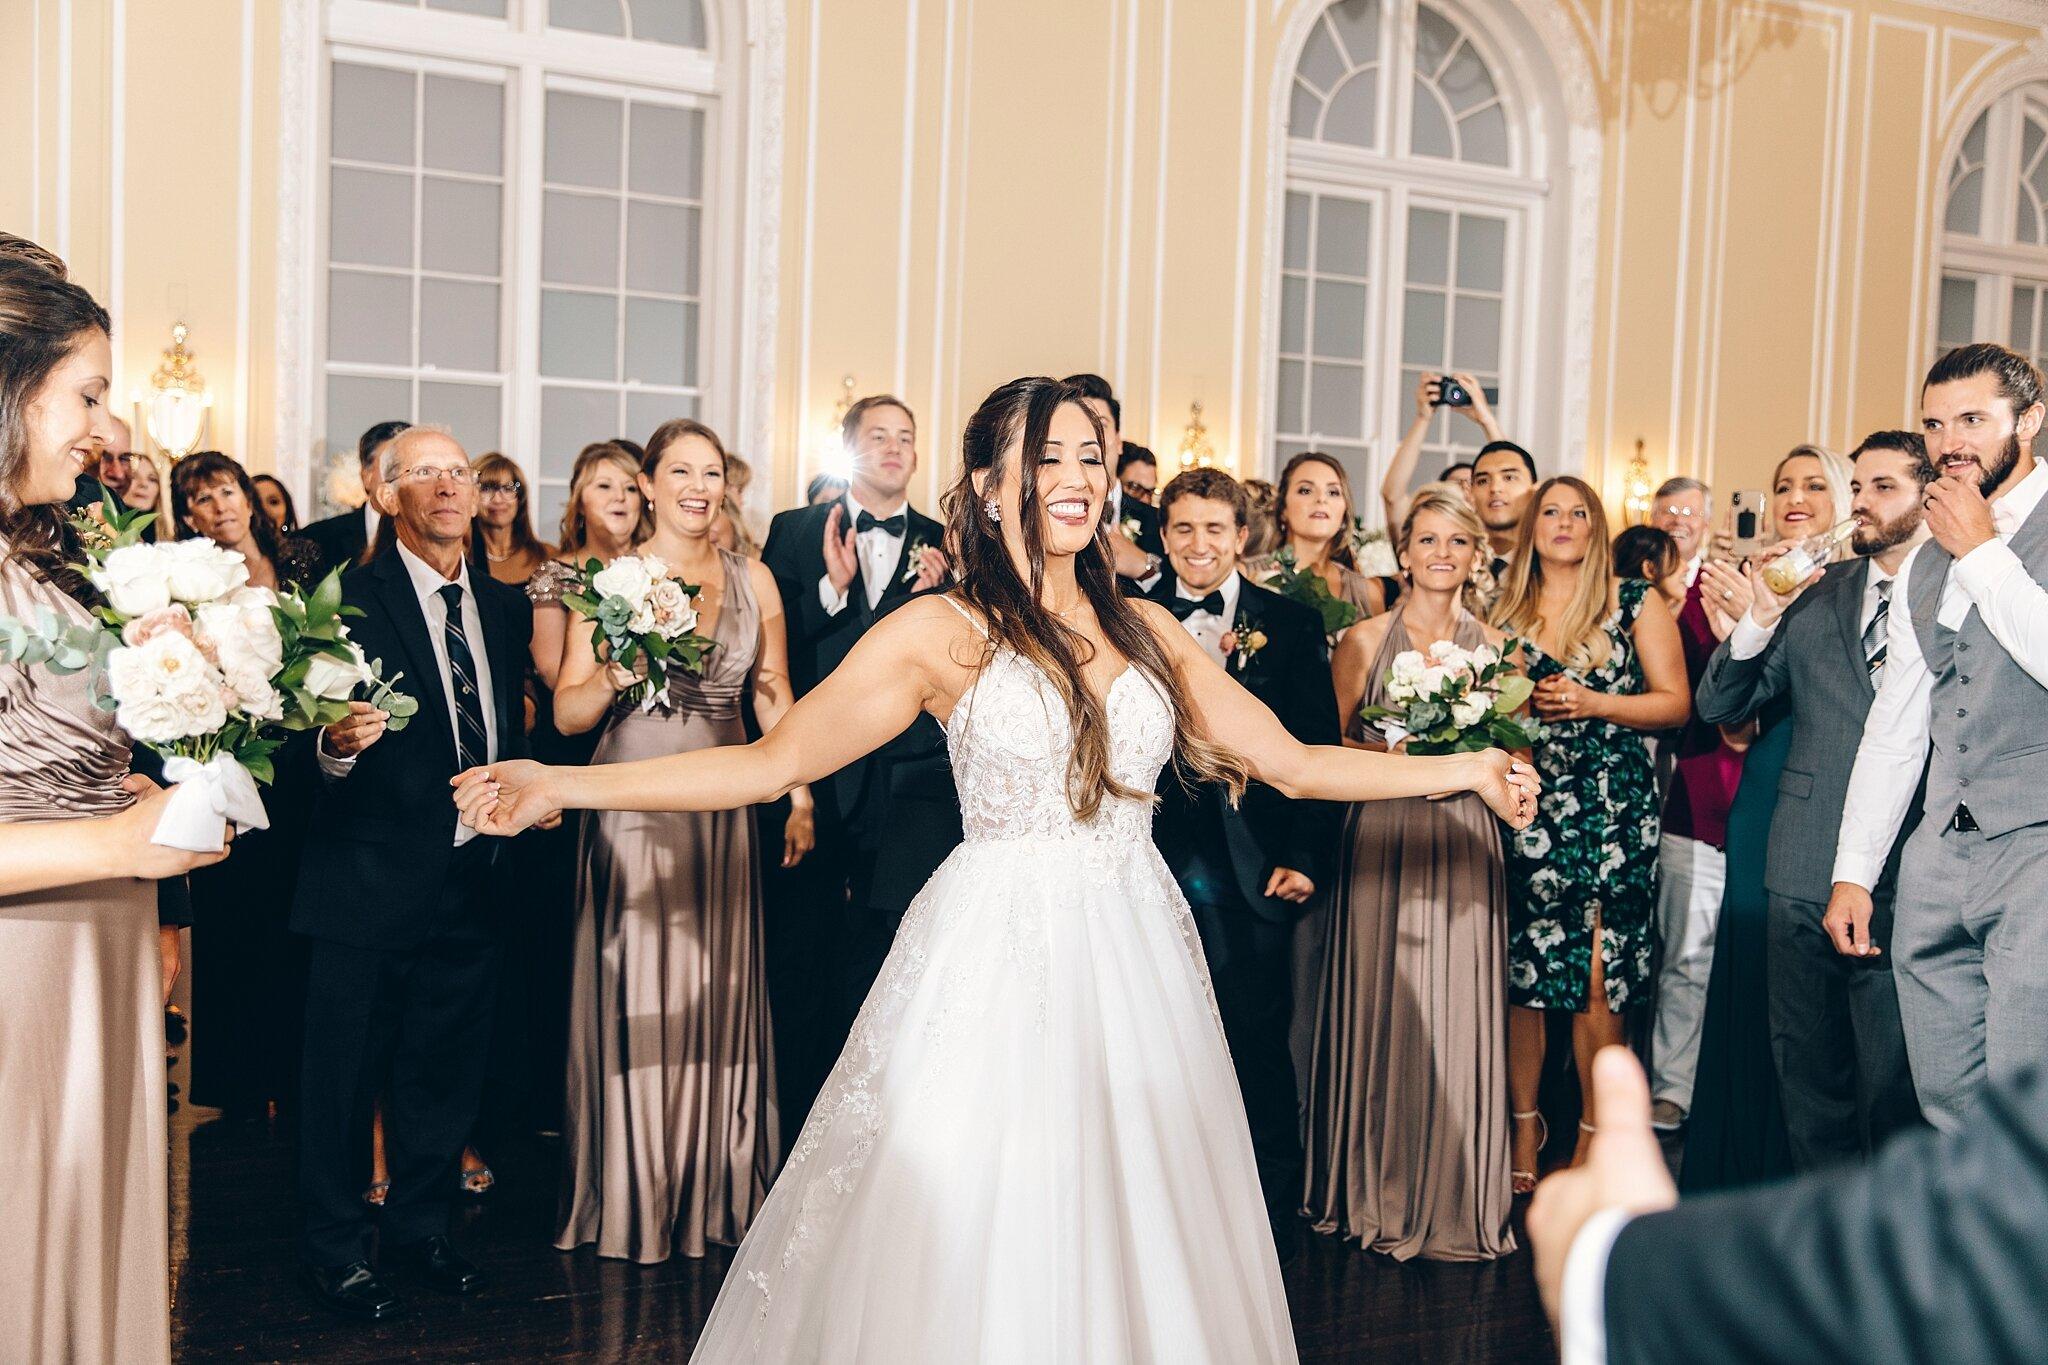 patrick-henry-ballroom-wedding-roanoke_0526.jpg